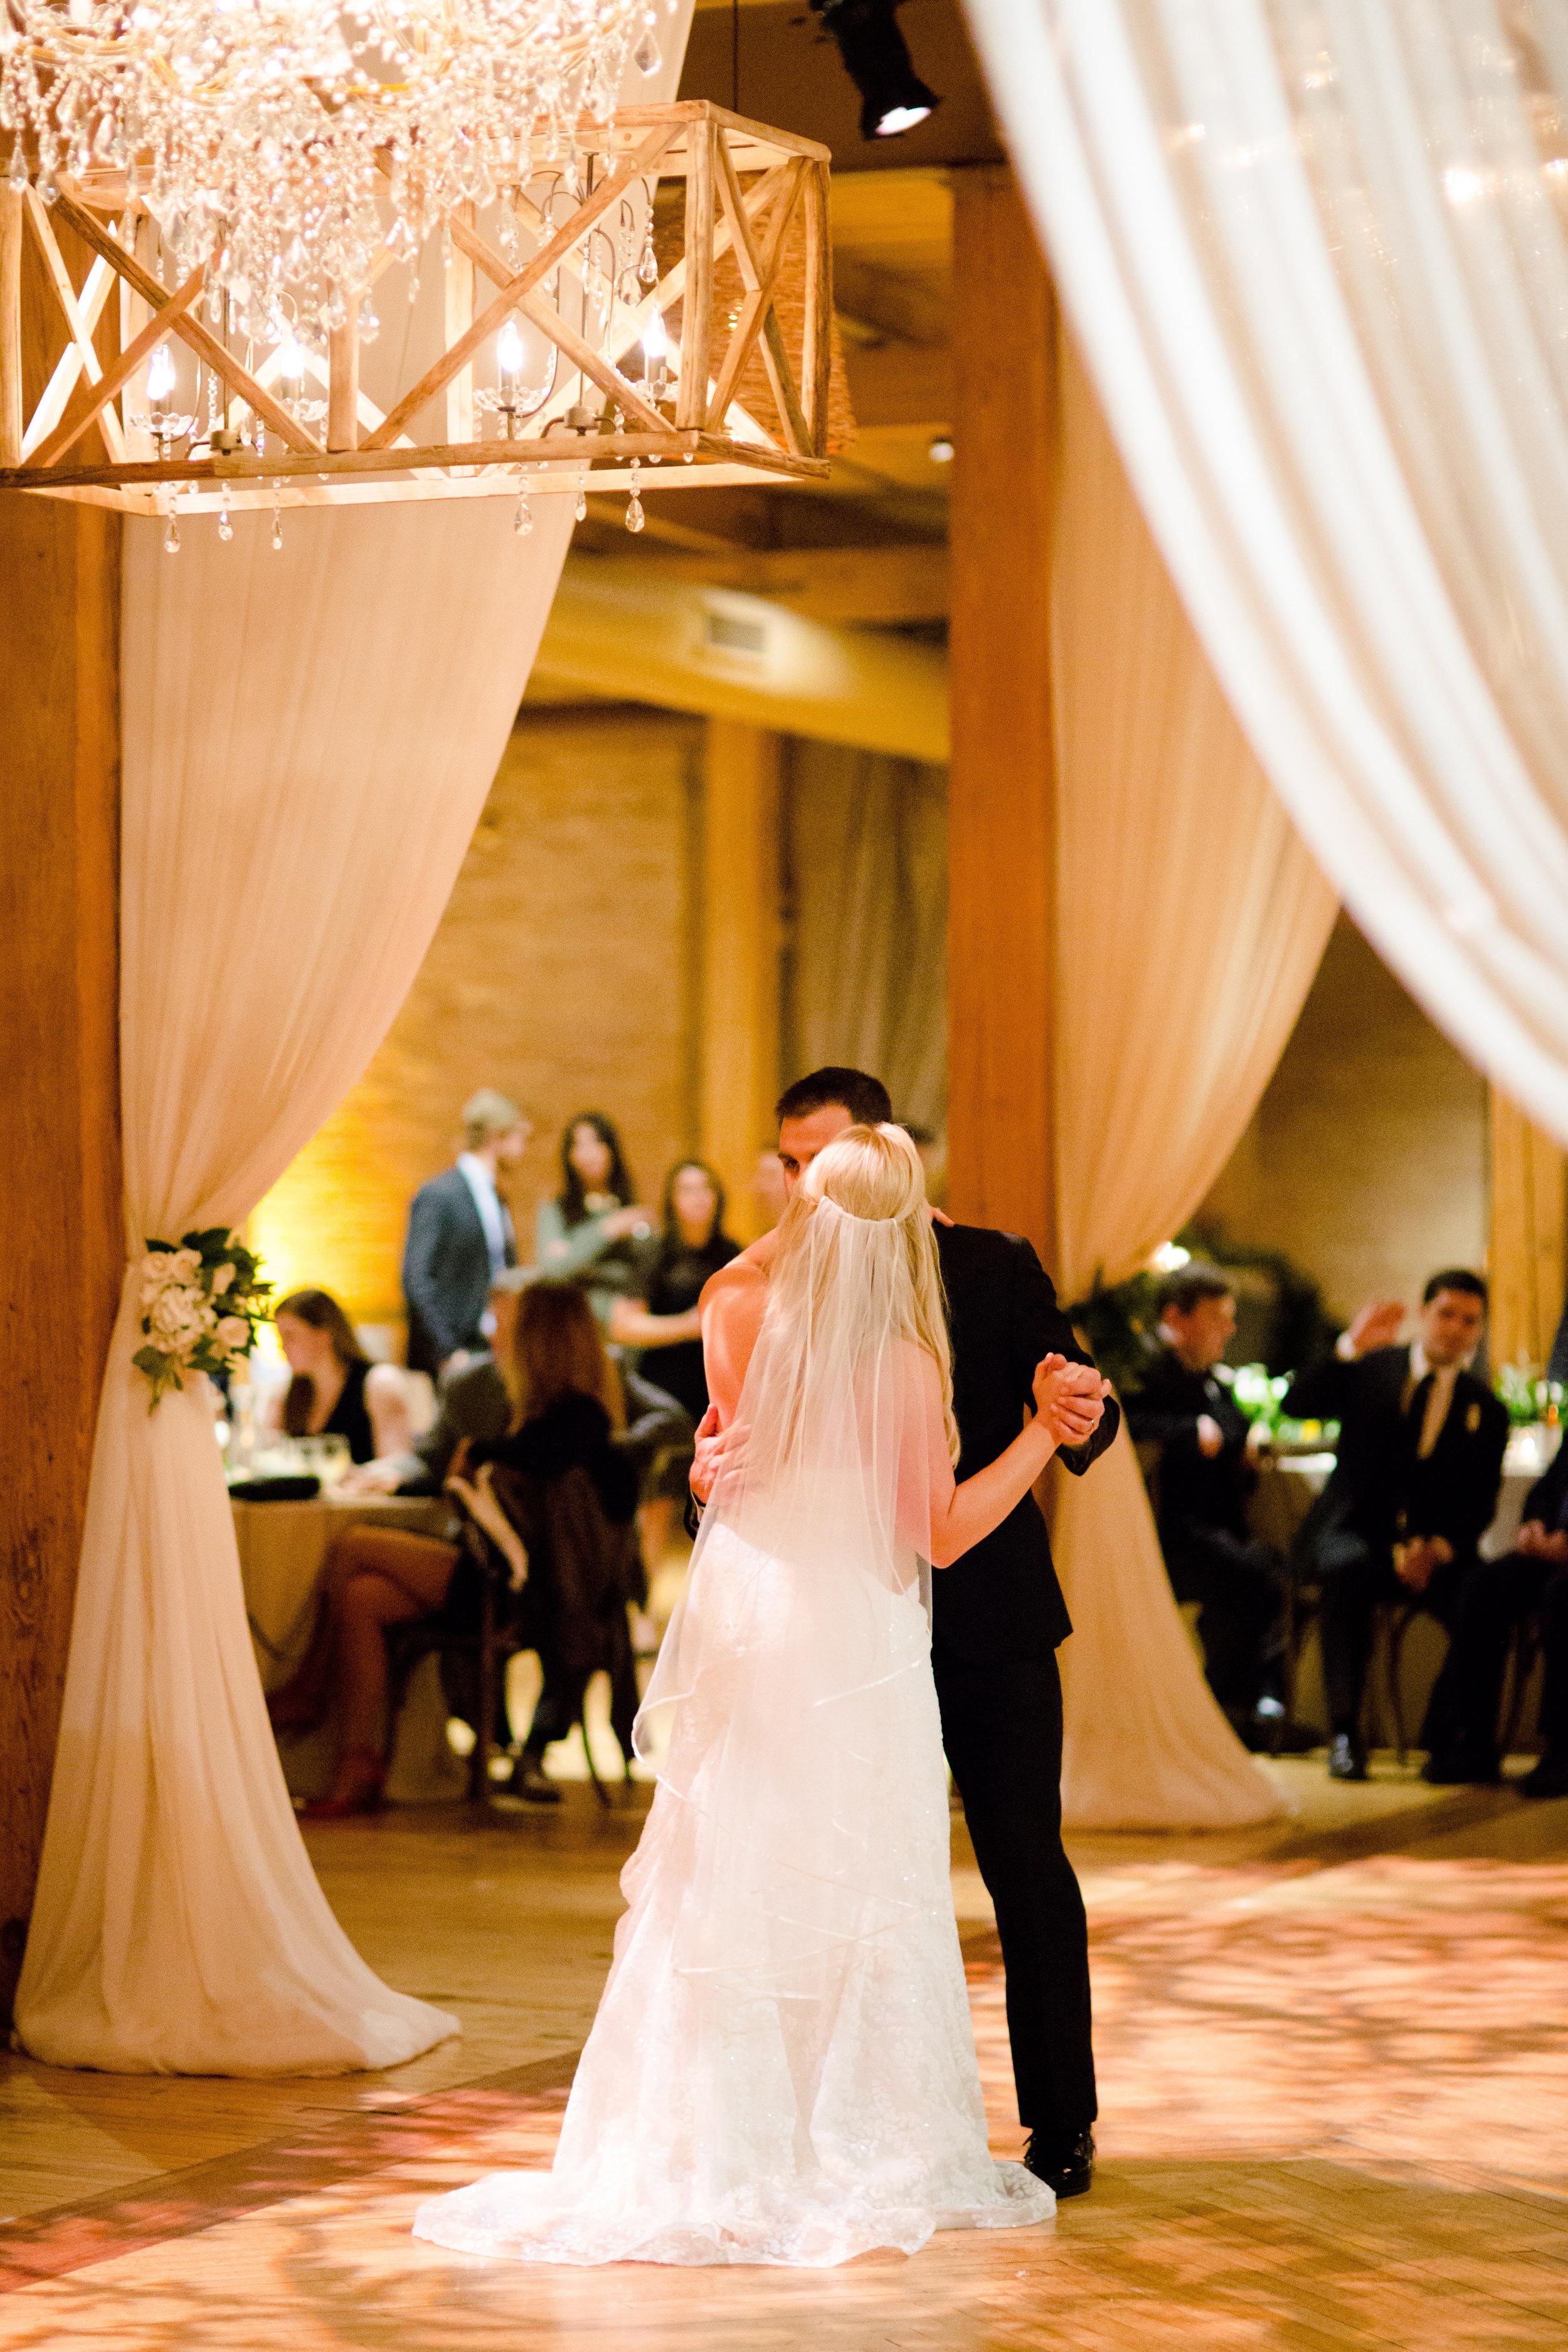 Rustic Bridgeport Art Center Wedding Chicago0117_YT8A2208.jpg